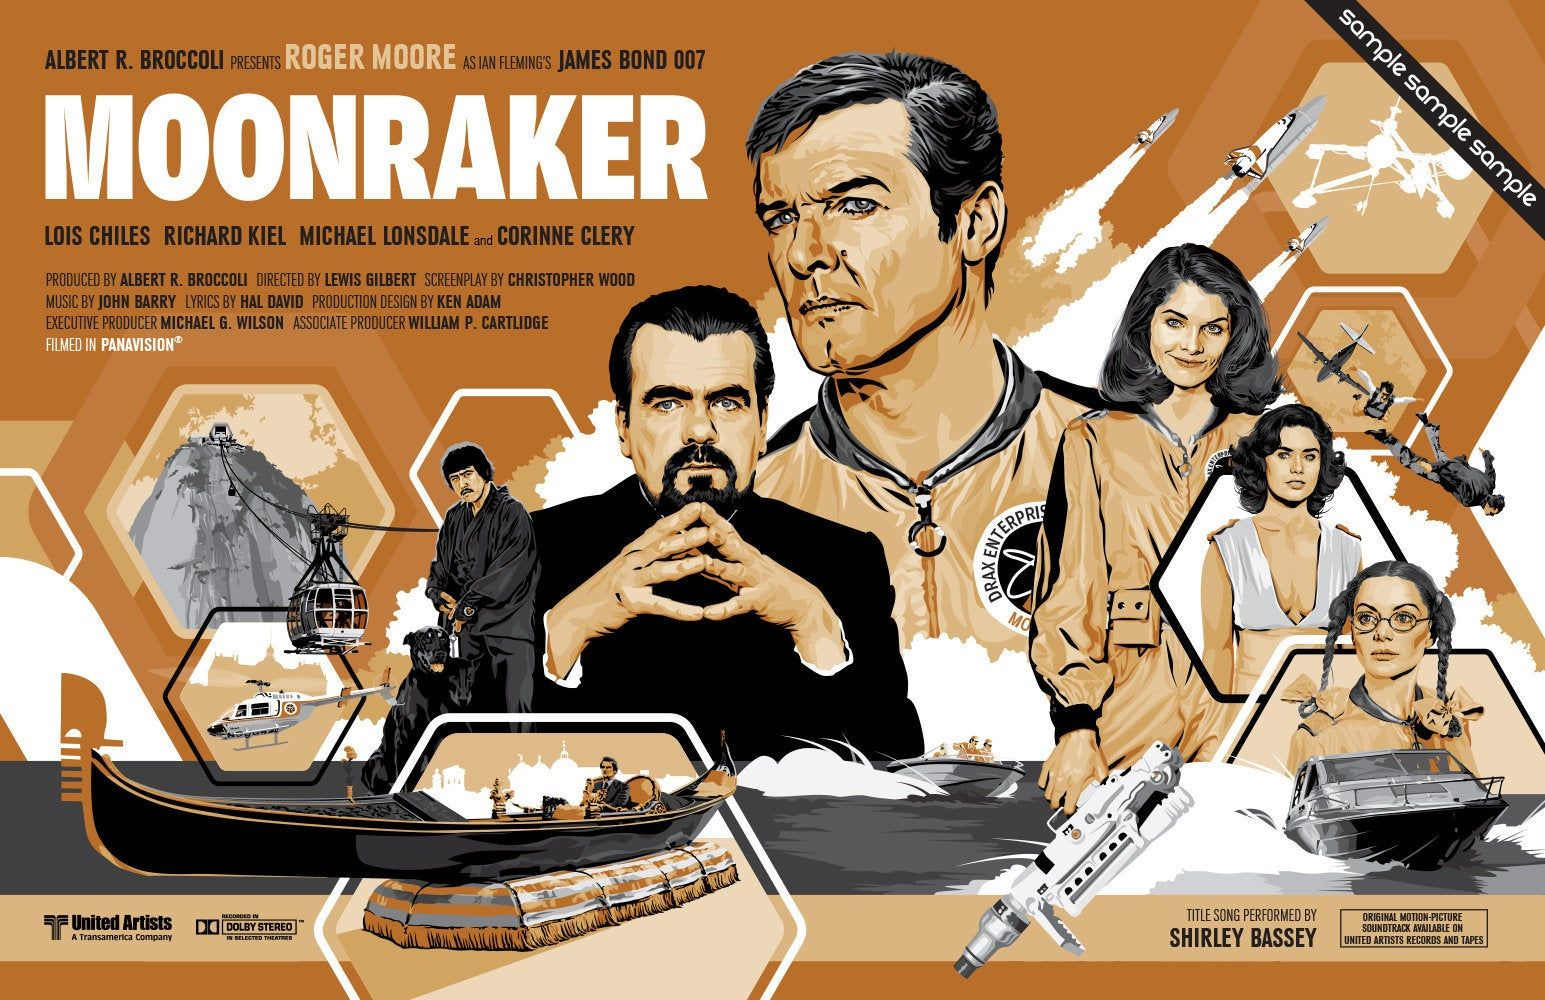 James Bond 007 Roger Moore Moonraker Updated Fan Art 17